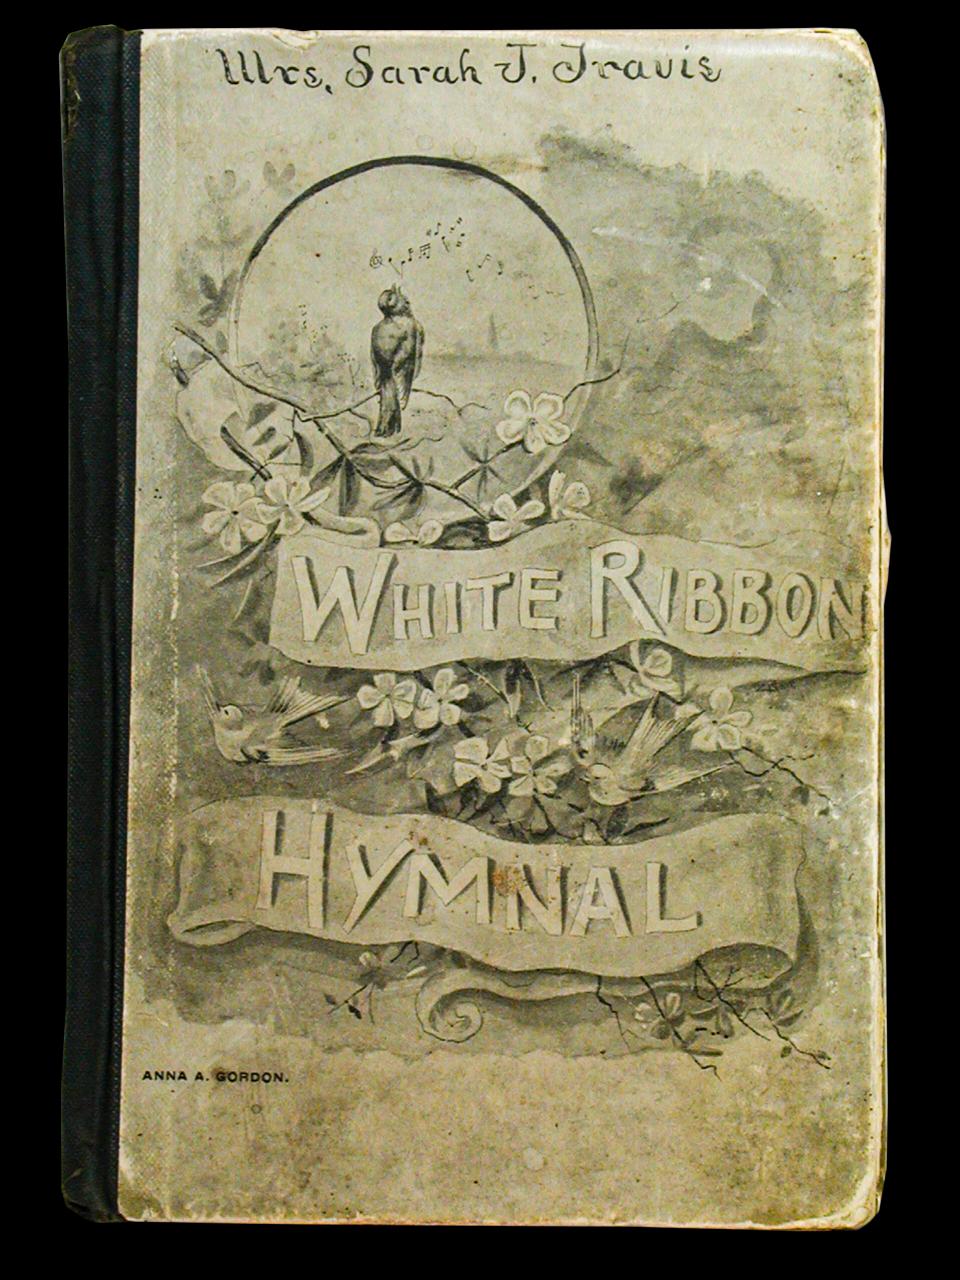 Artifact, songbook